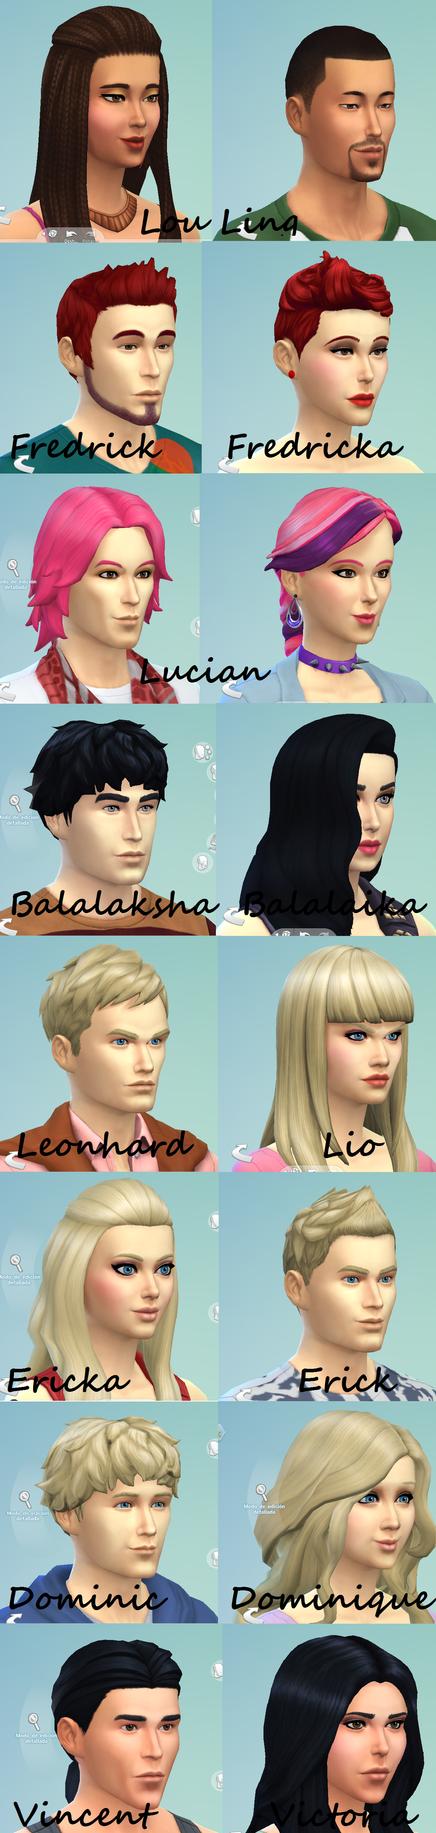 Sims - Genderbender by Starebelle